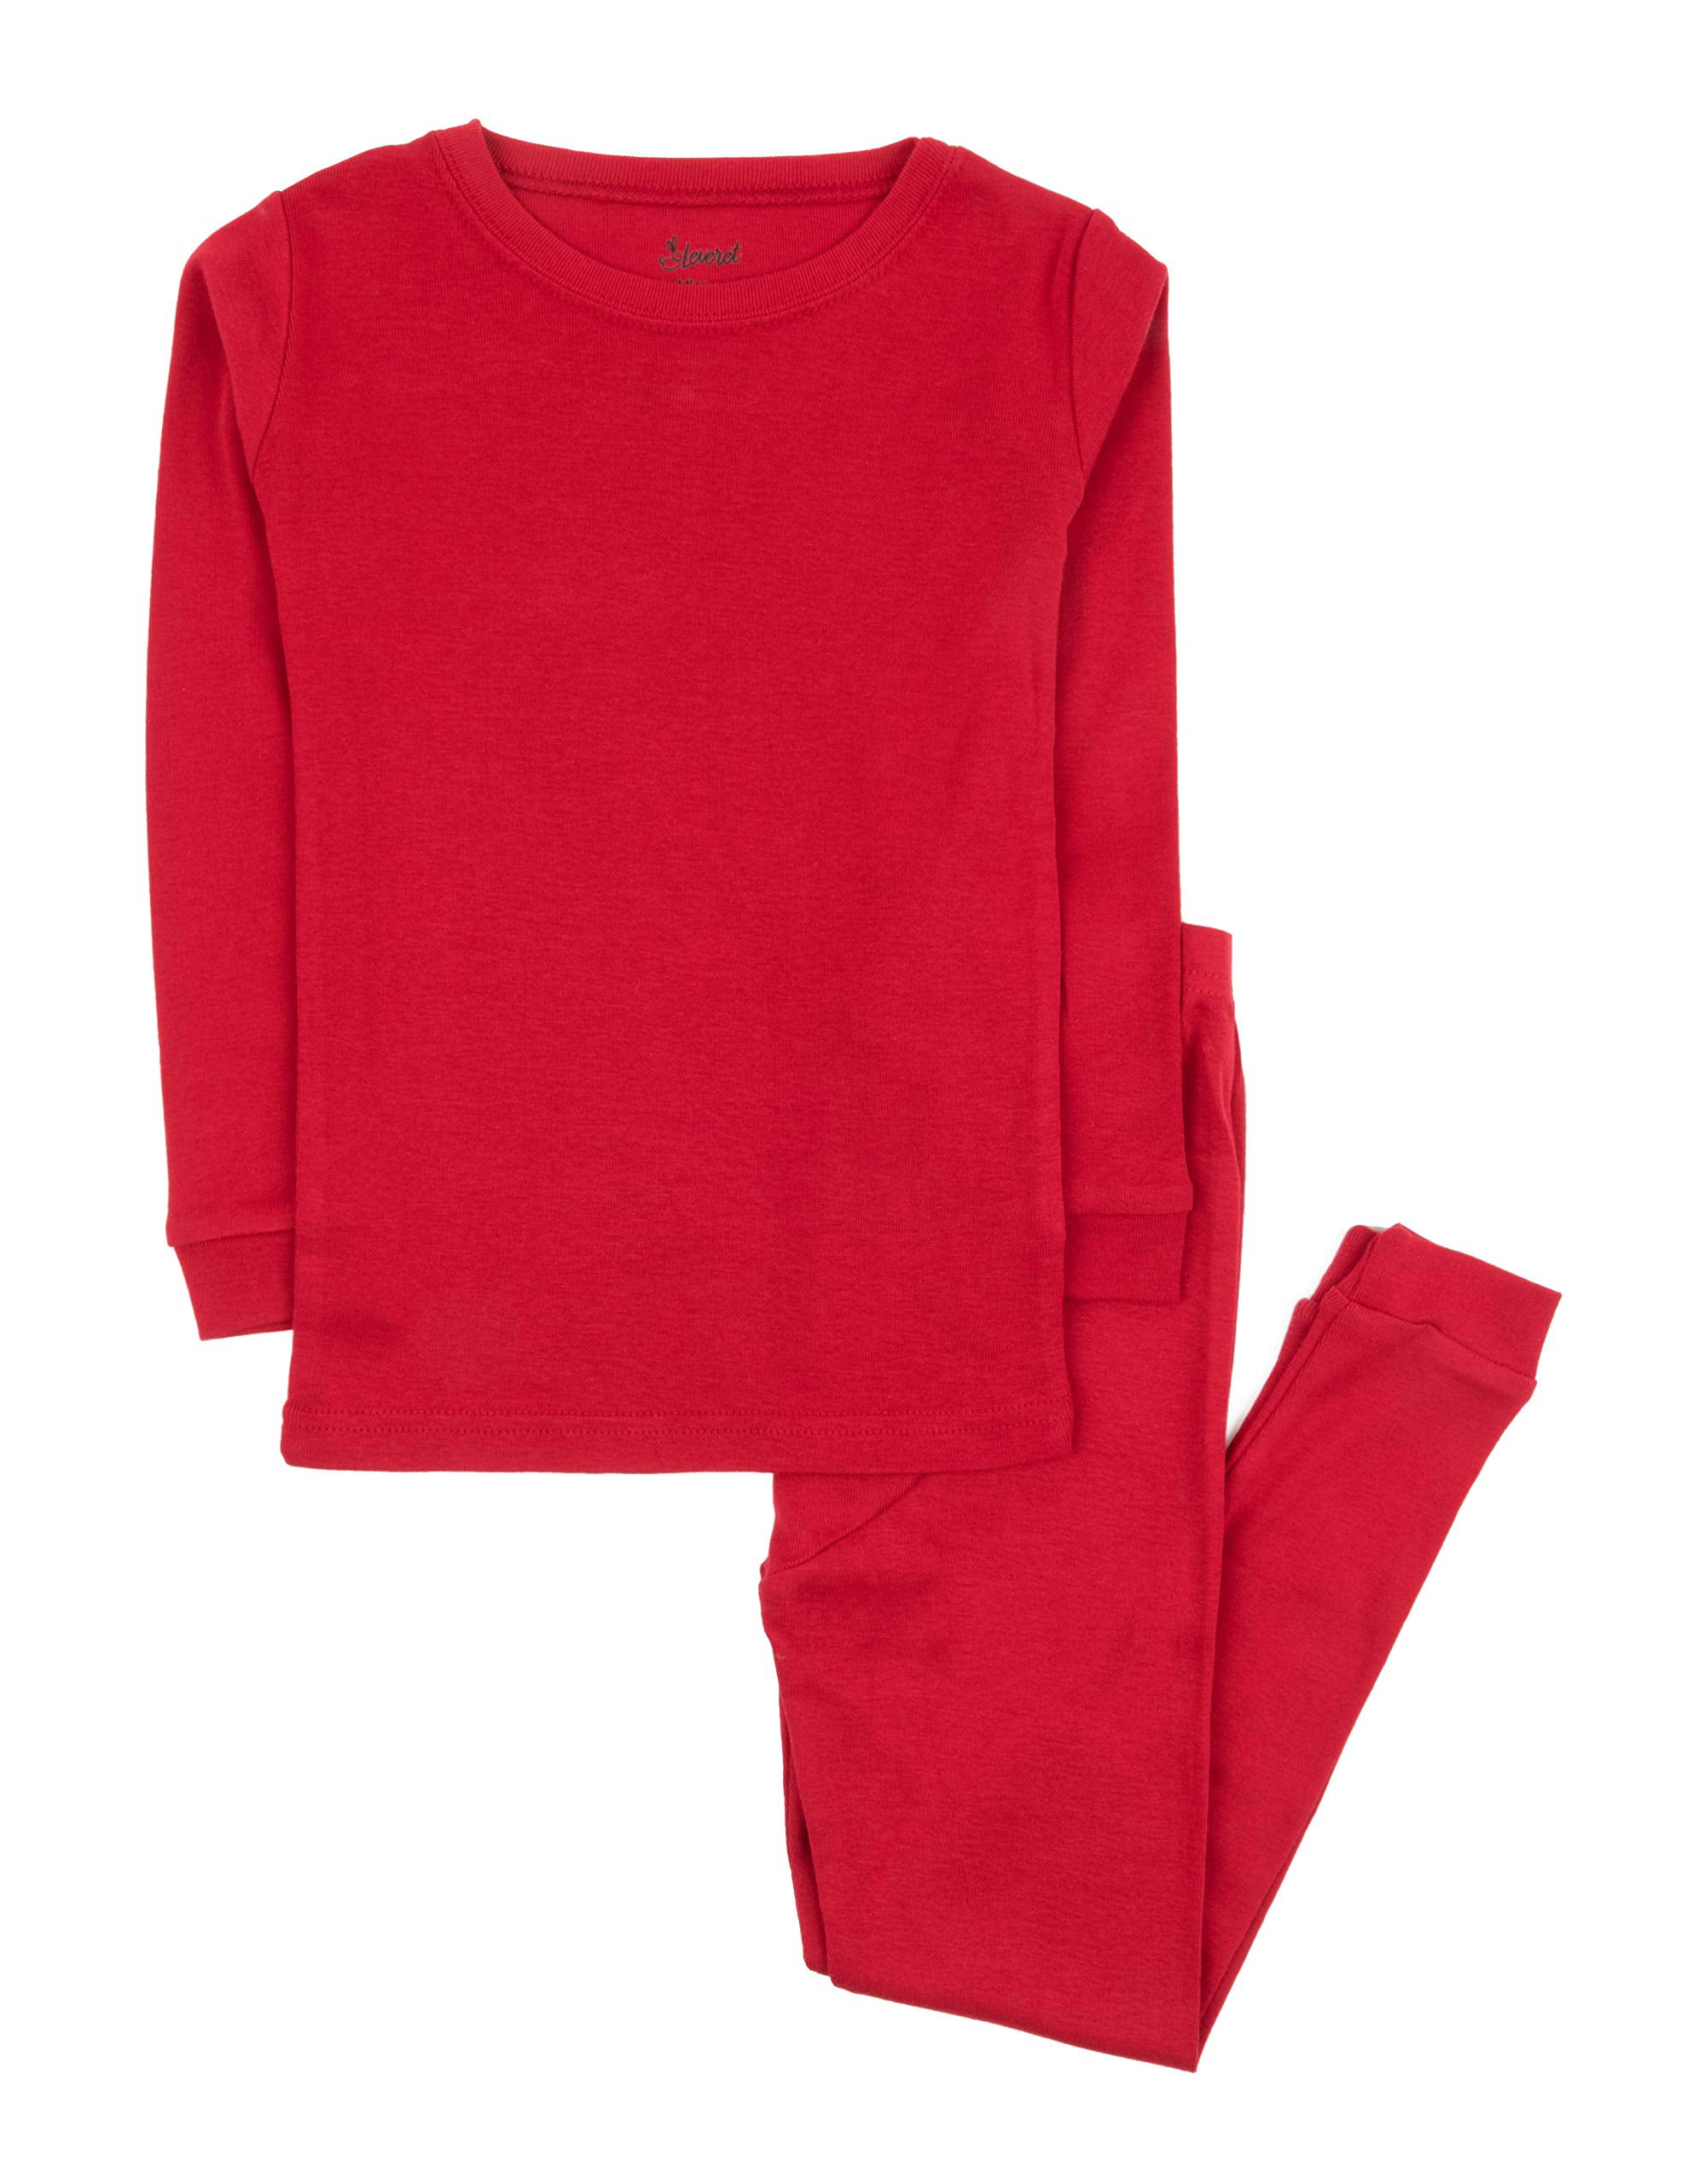 Custom Baby /& Toddler T-Shirt Boy Pajama Gift Red Cotton Boy Girl Clothes